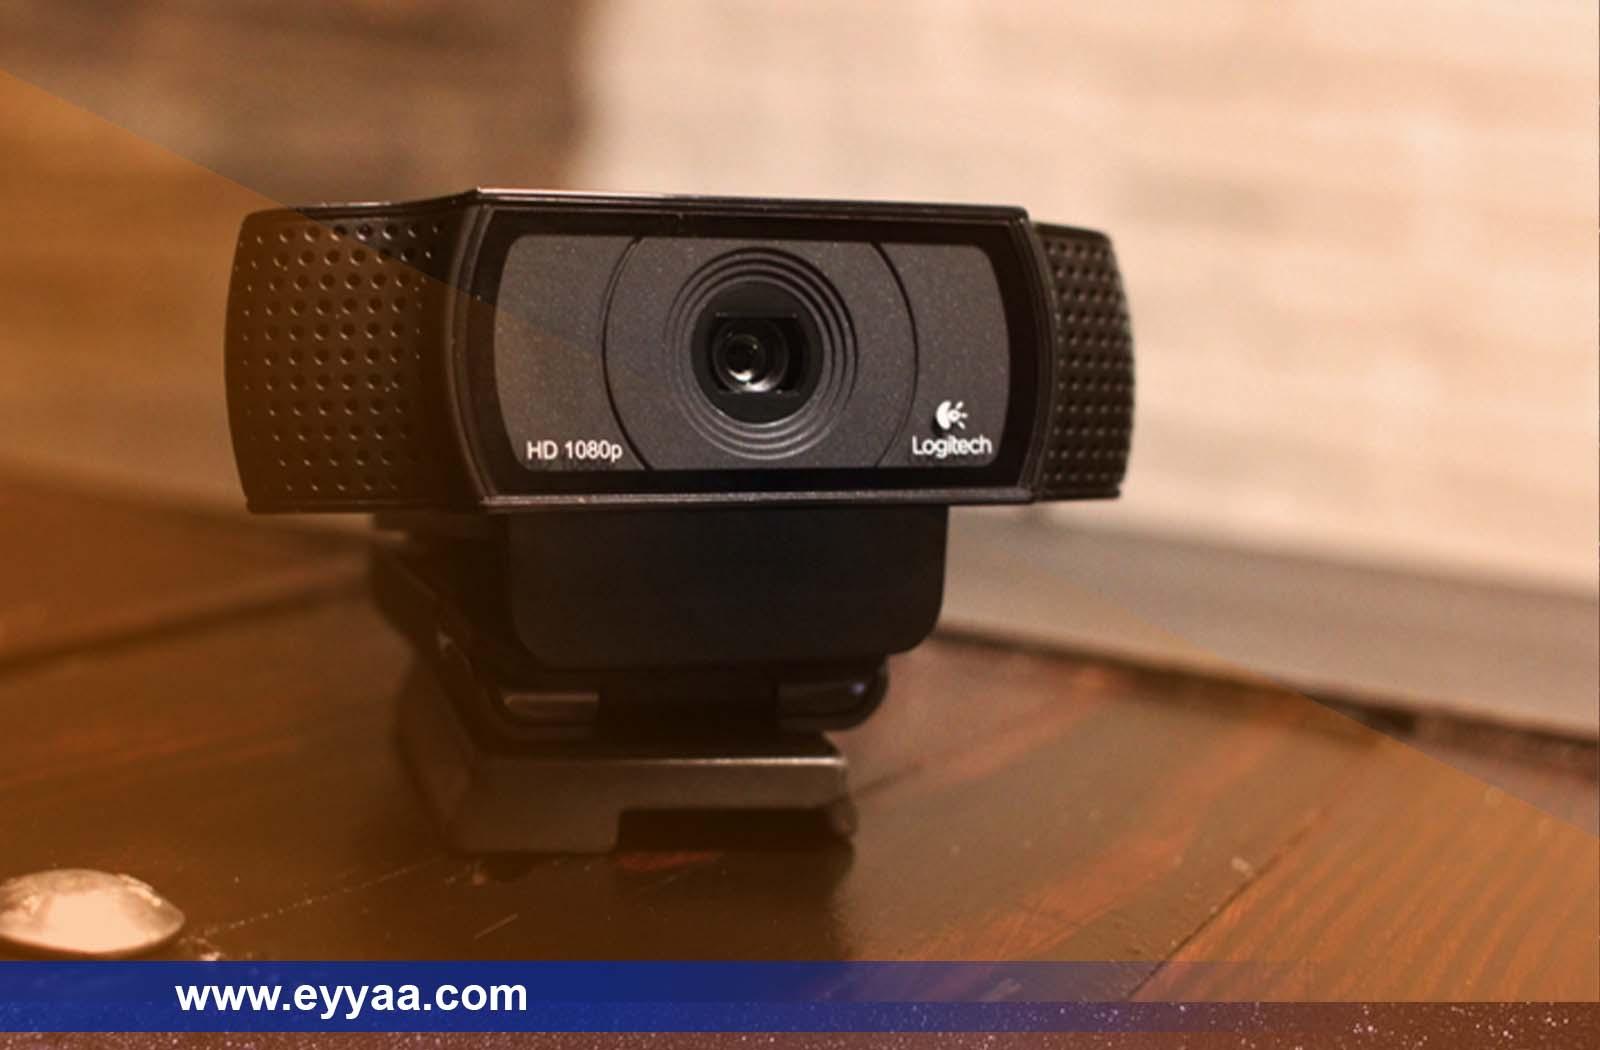 Top 5 Best Wireless Webcam For Mac 2020 Review